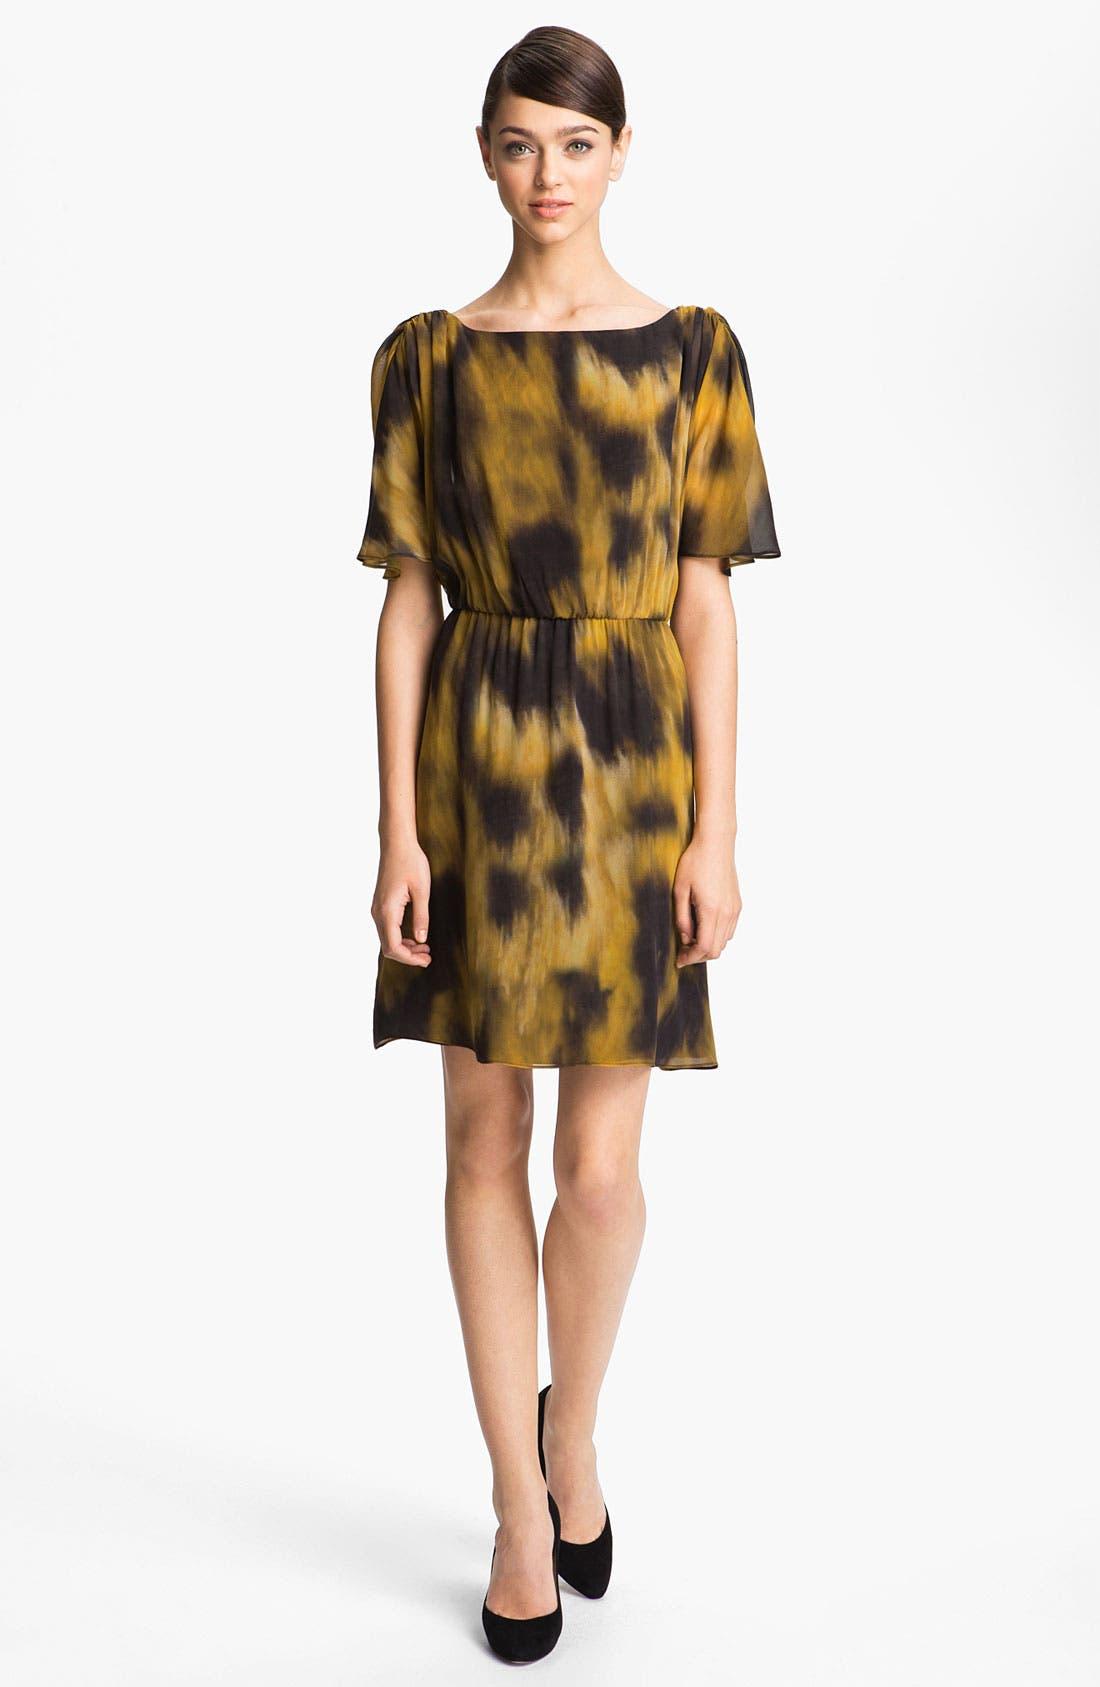 Alternate Image 1 Selected - Alice + Olivia 'Jillianne' Print Blouson Dress